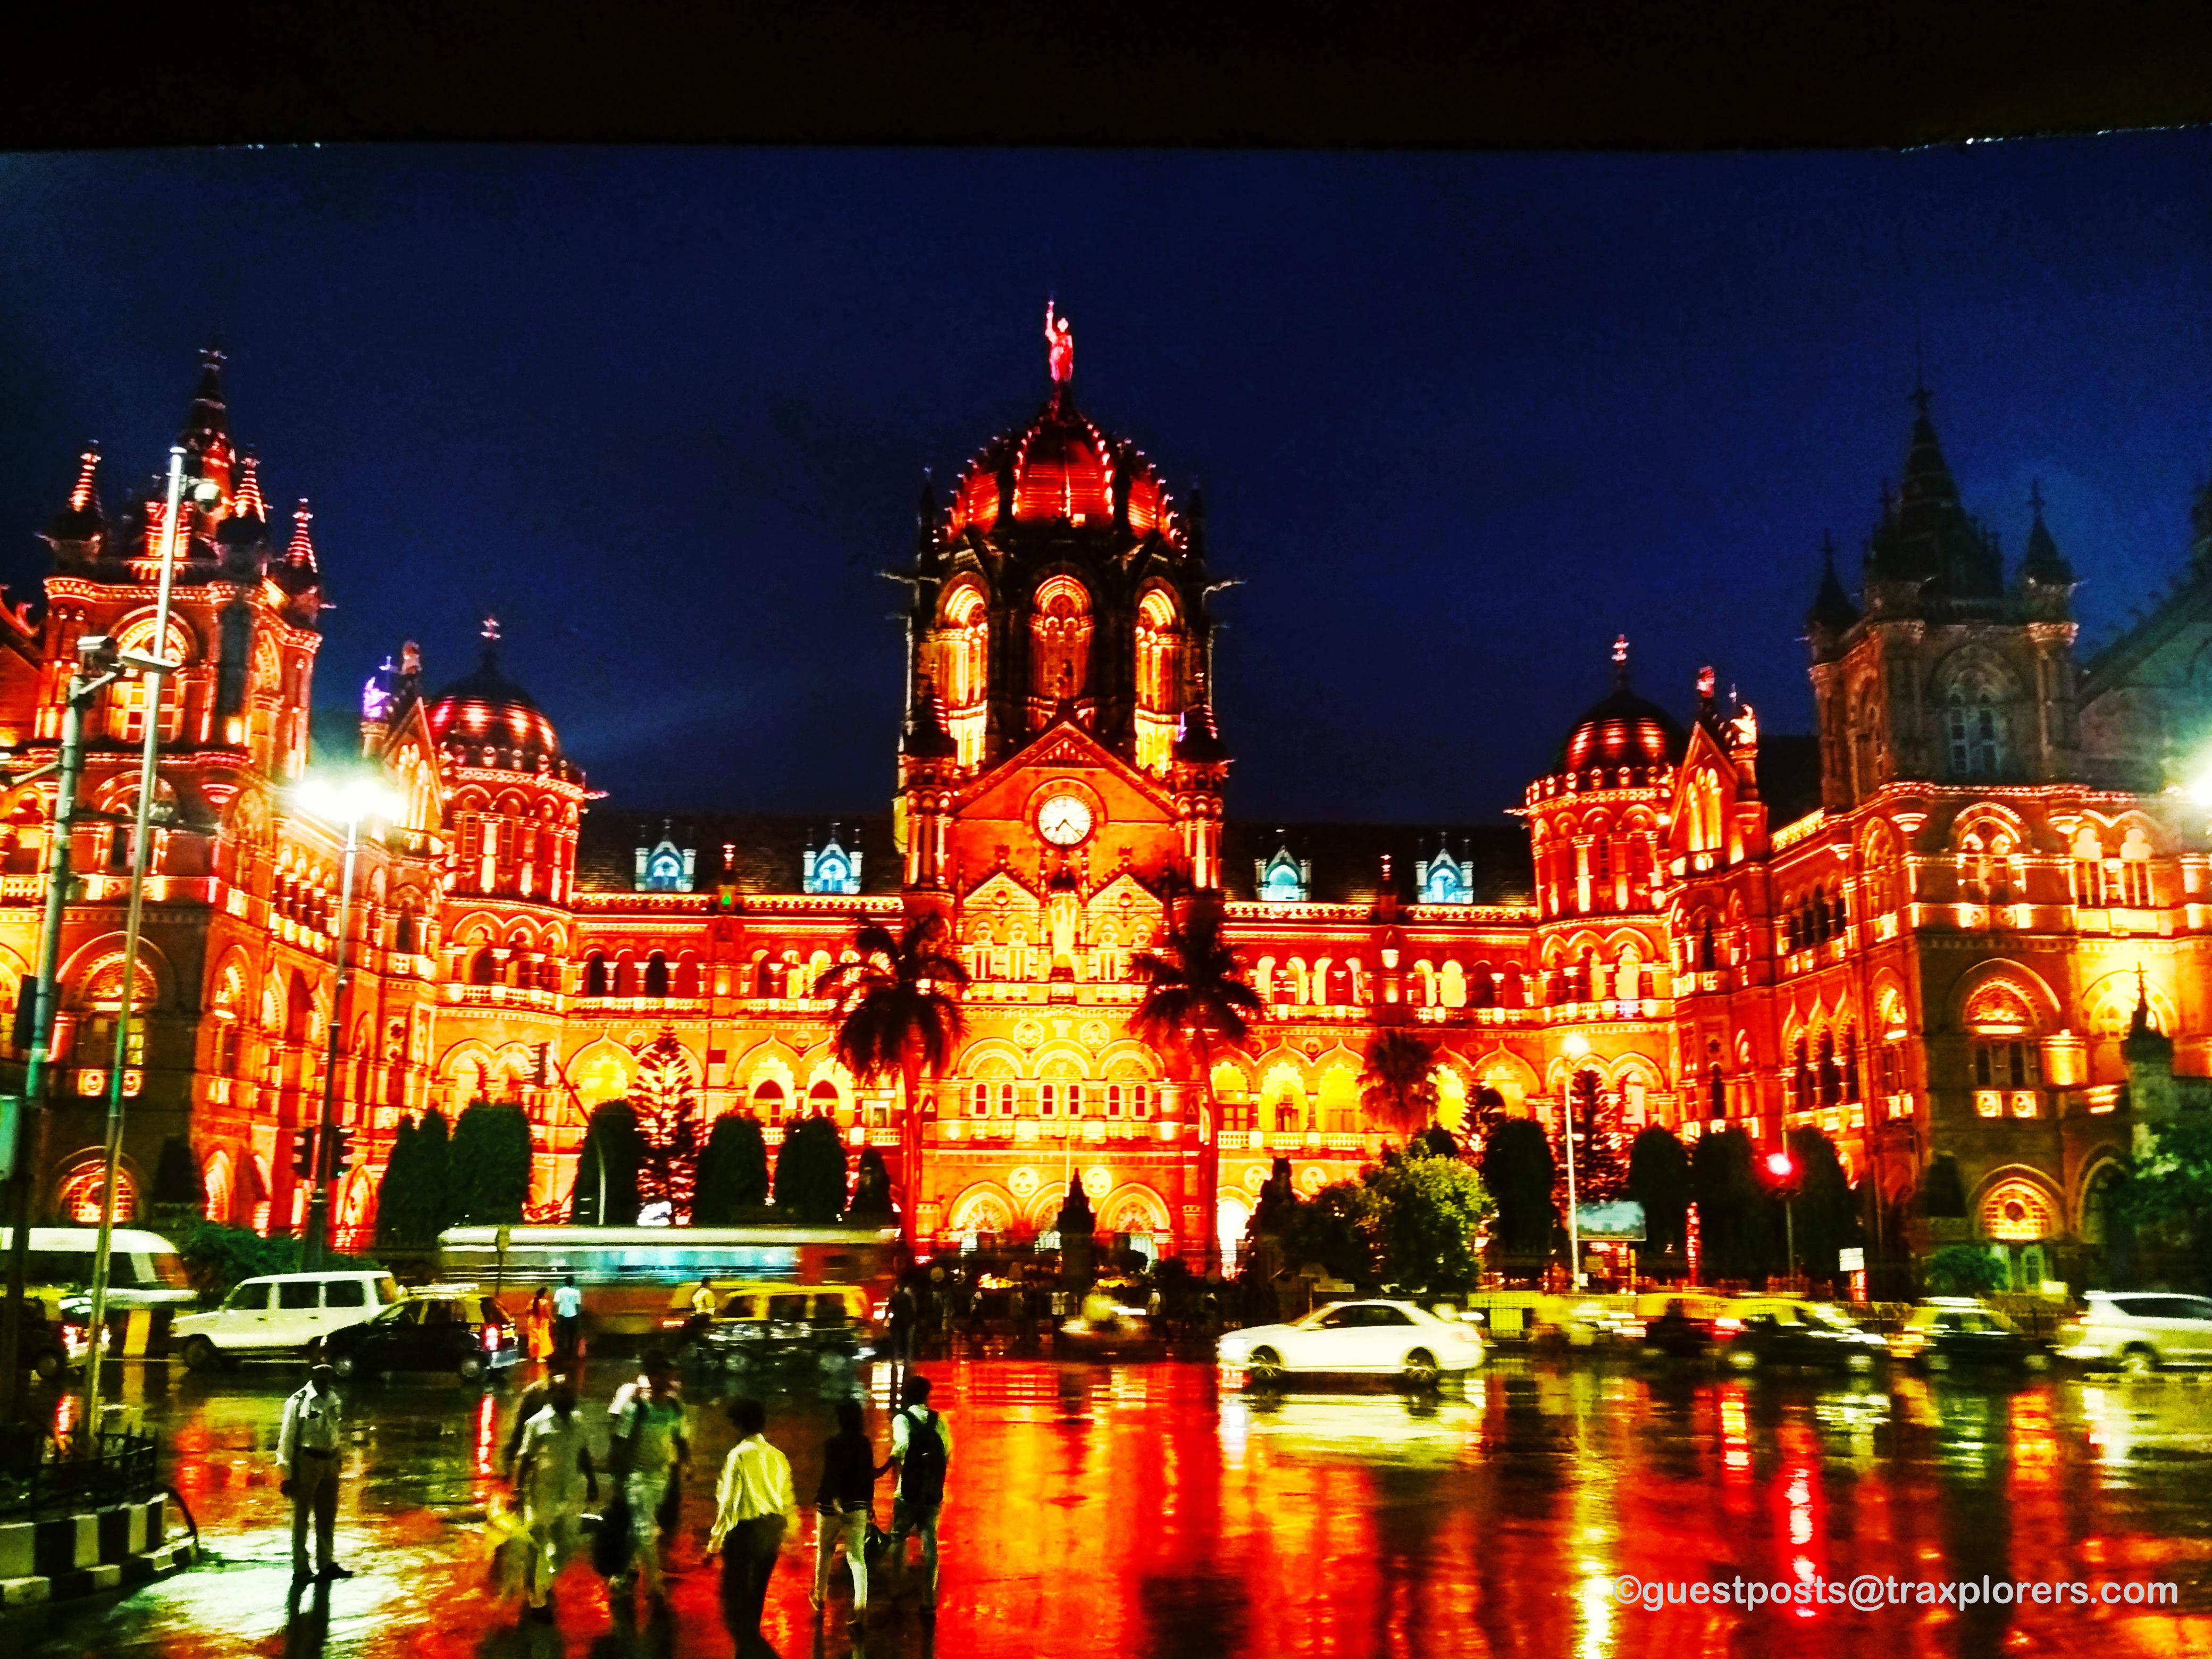 Chhatrapati Shivaji Maharaj Terminal. guestposts@traxplorers.com